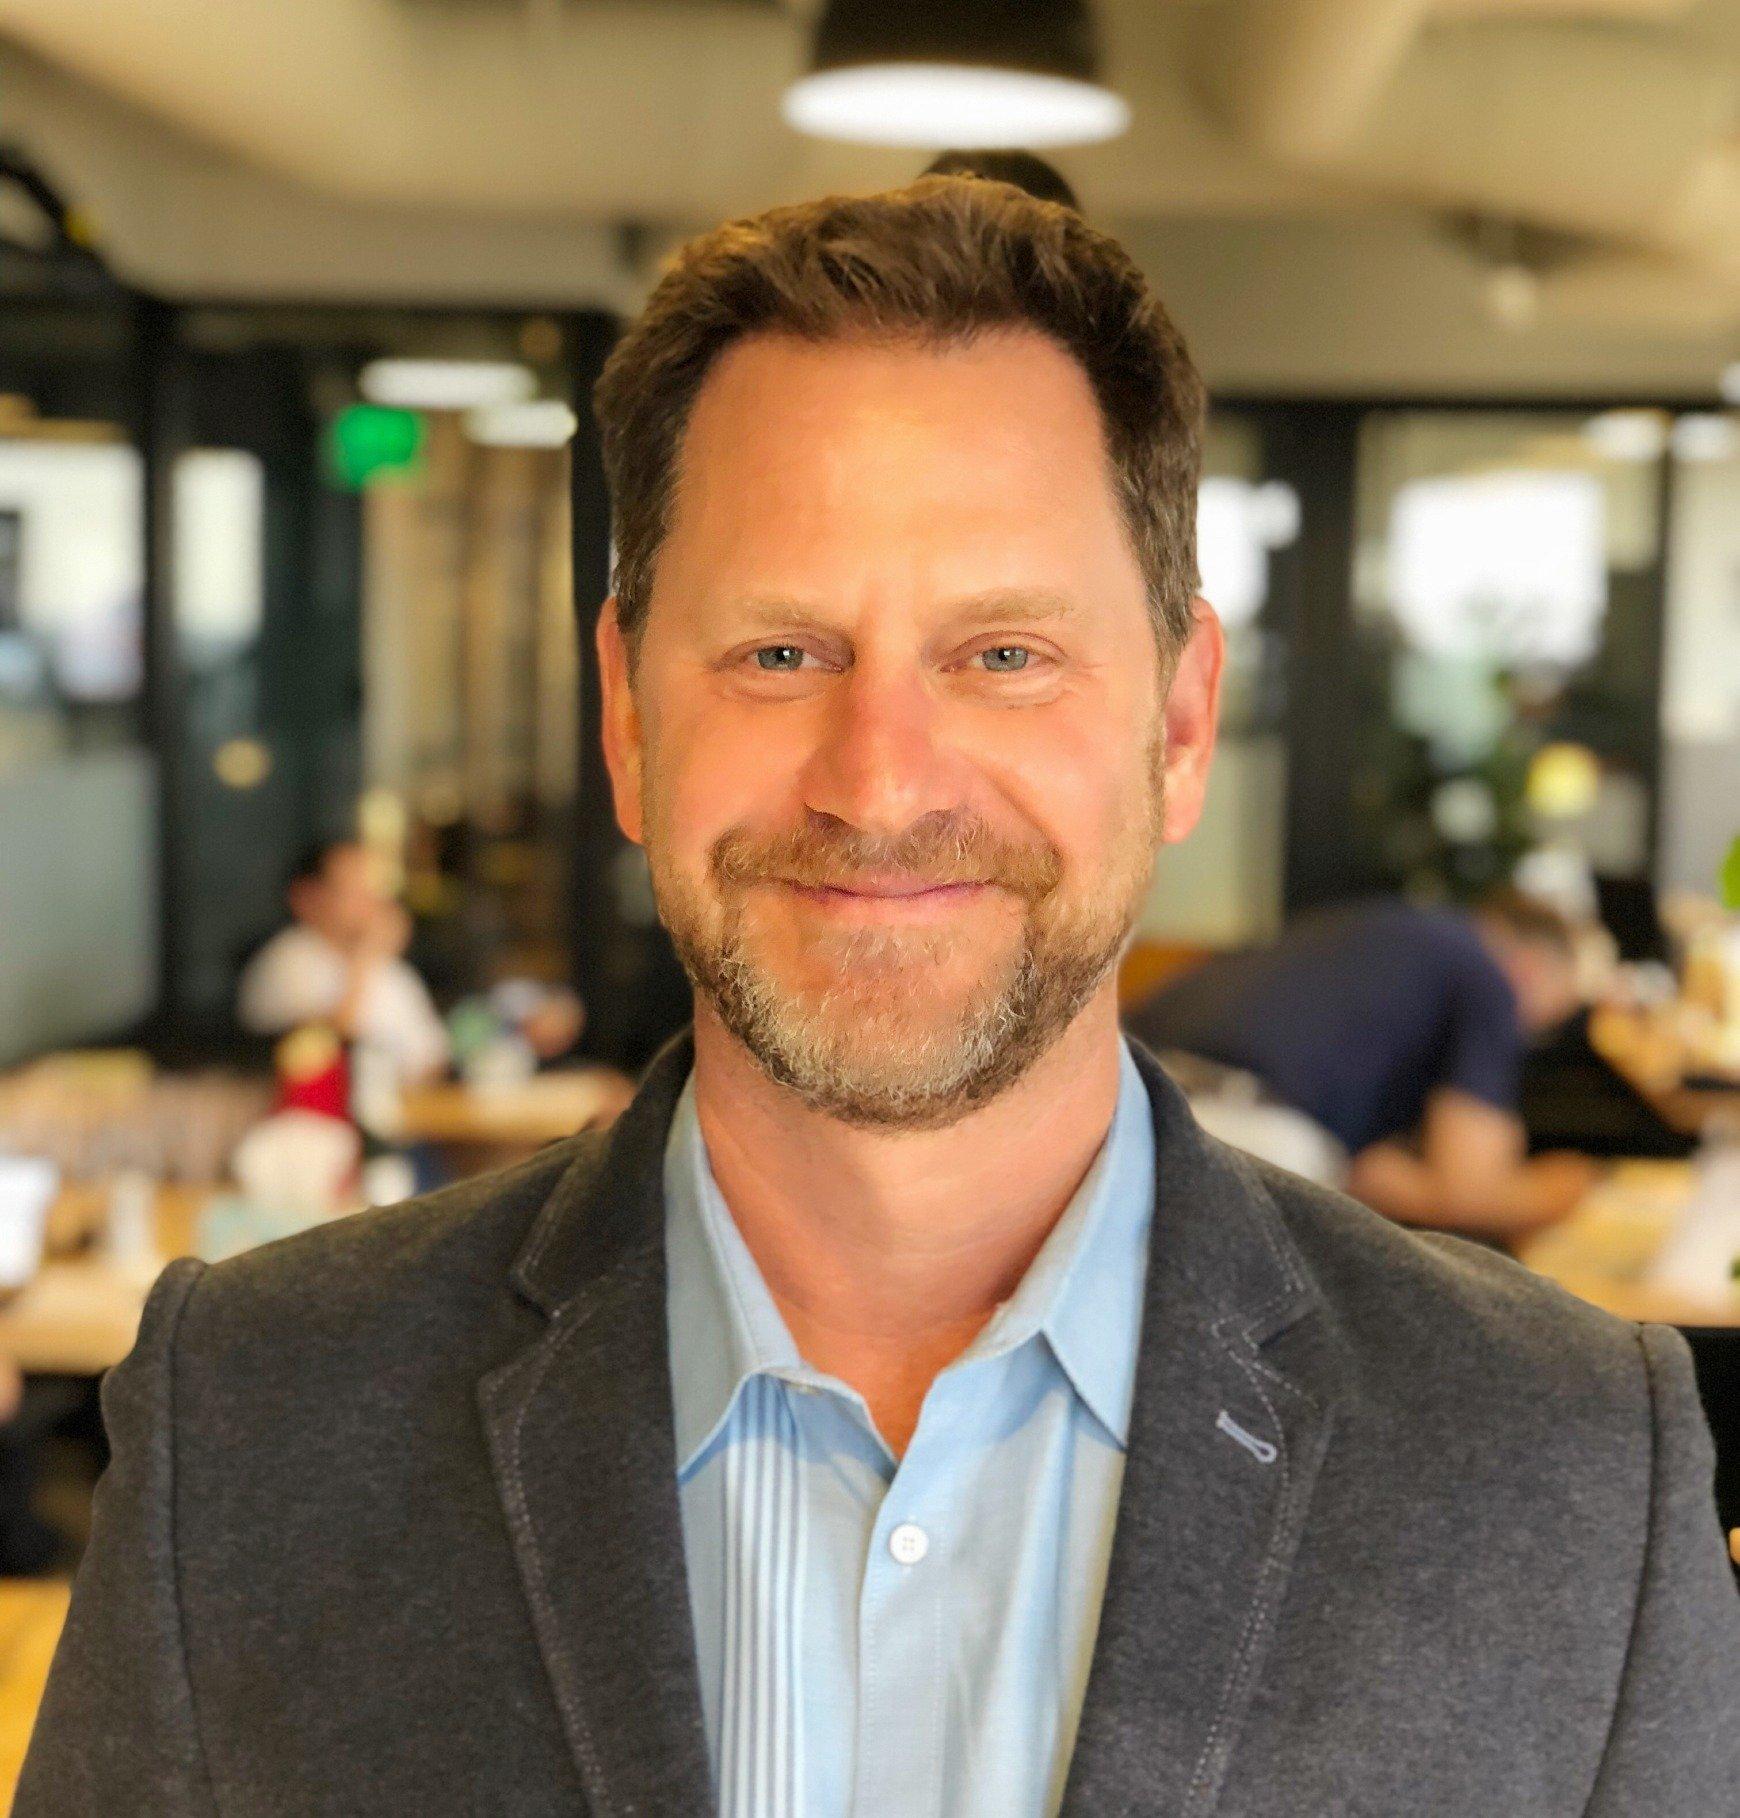 LOOP MEDIA CEO AND CO-FOUNDER JON NIERMANN